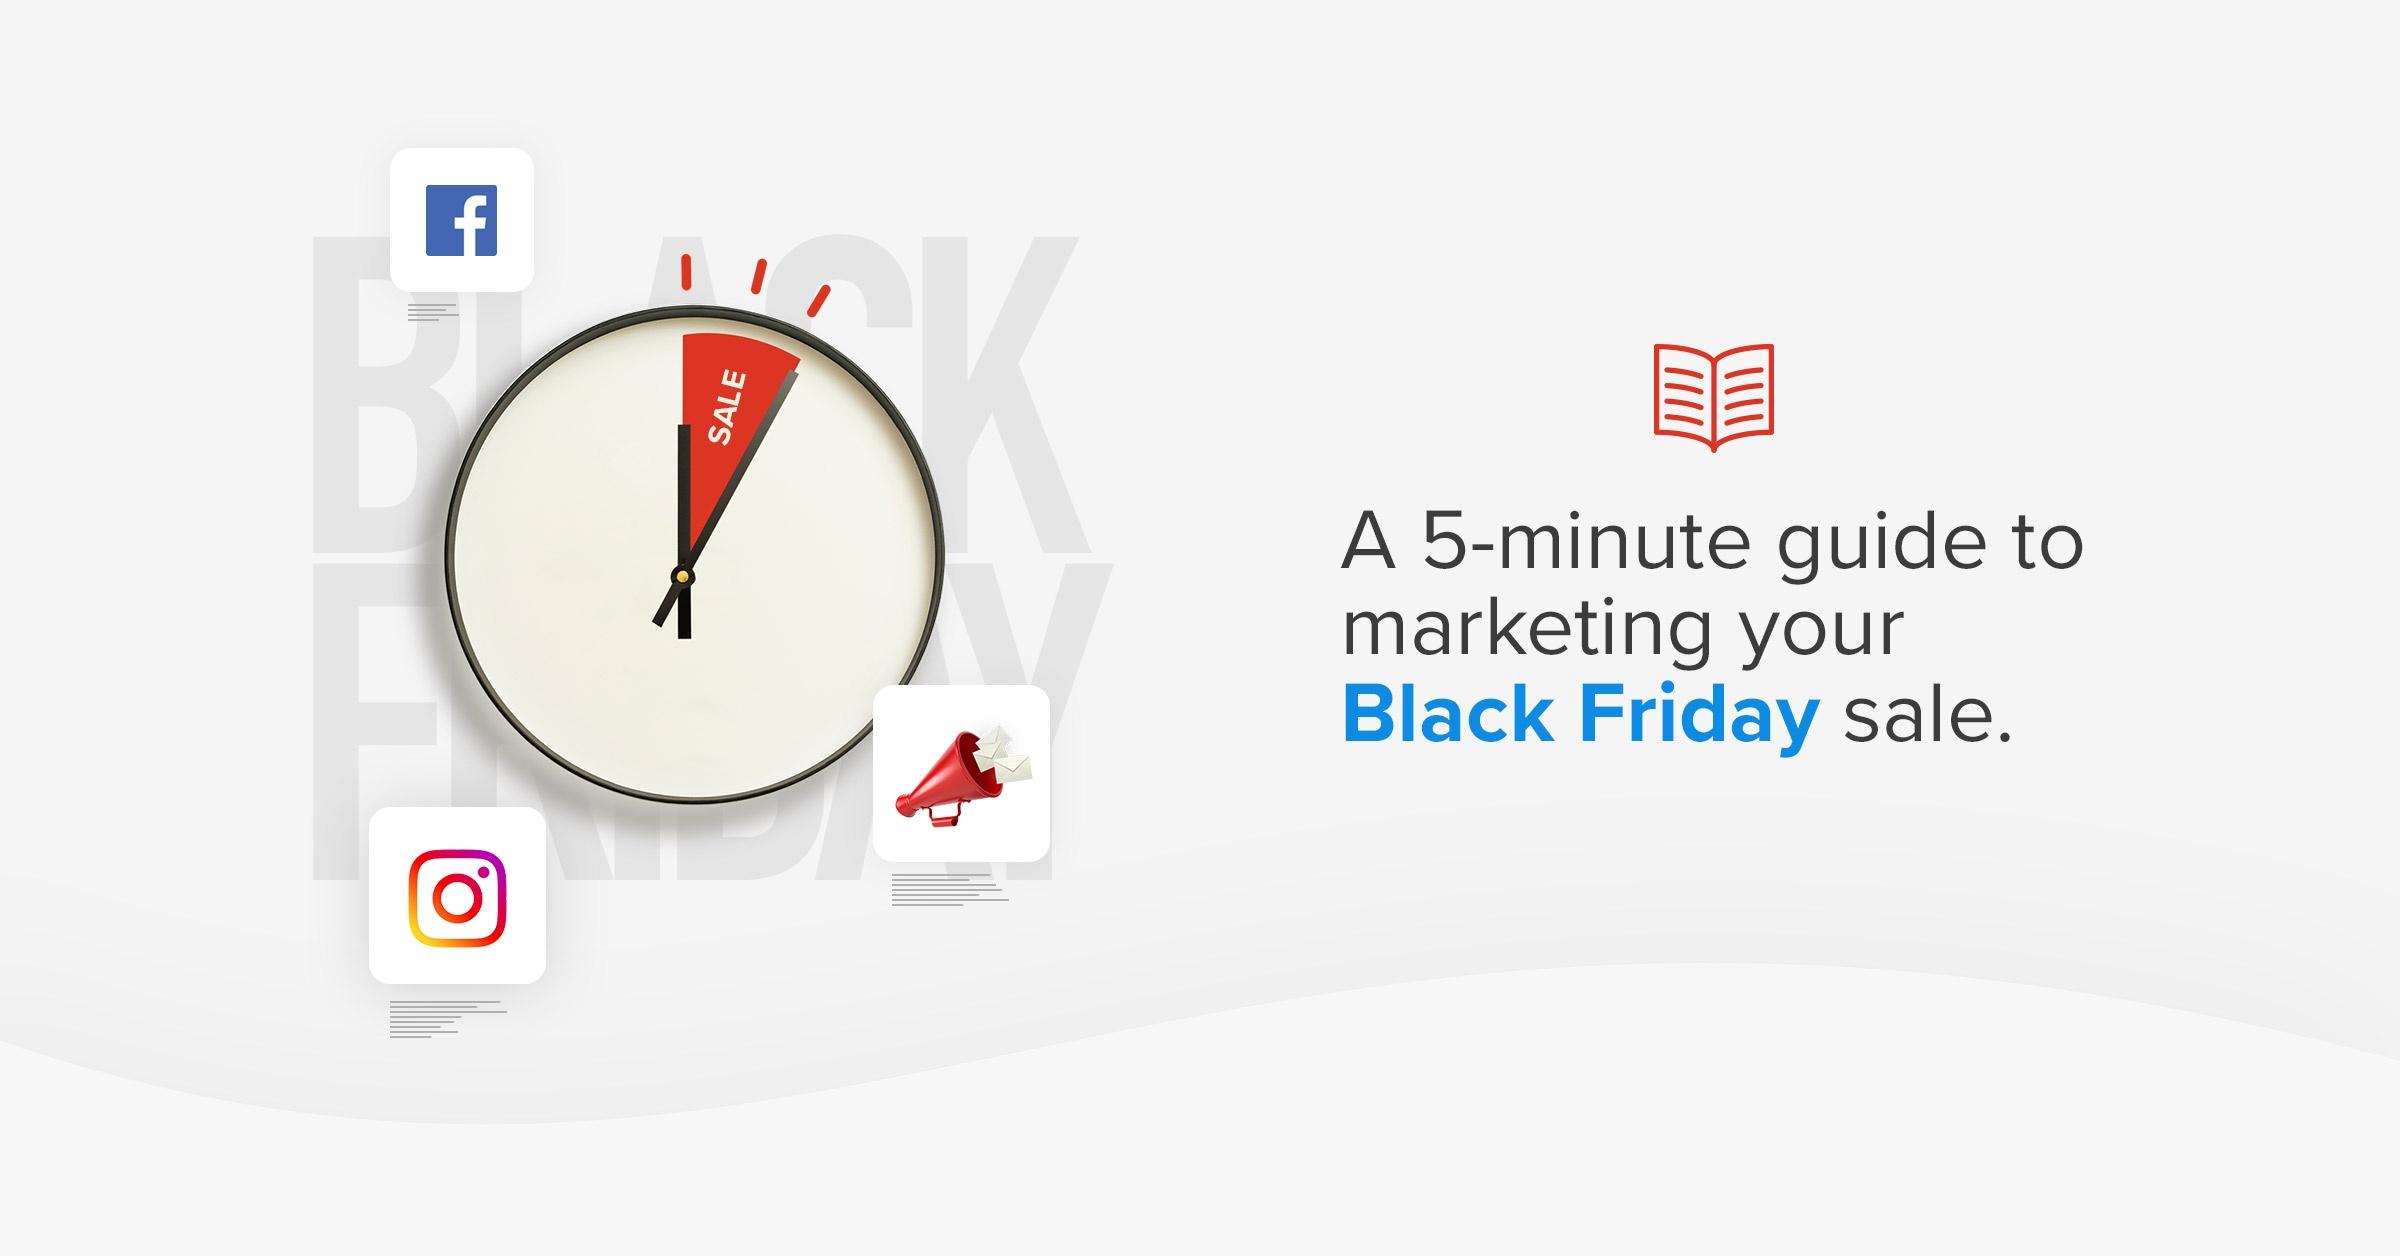 Black Friday marketing guide